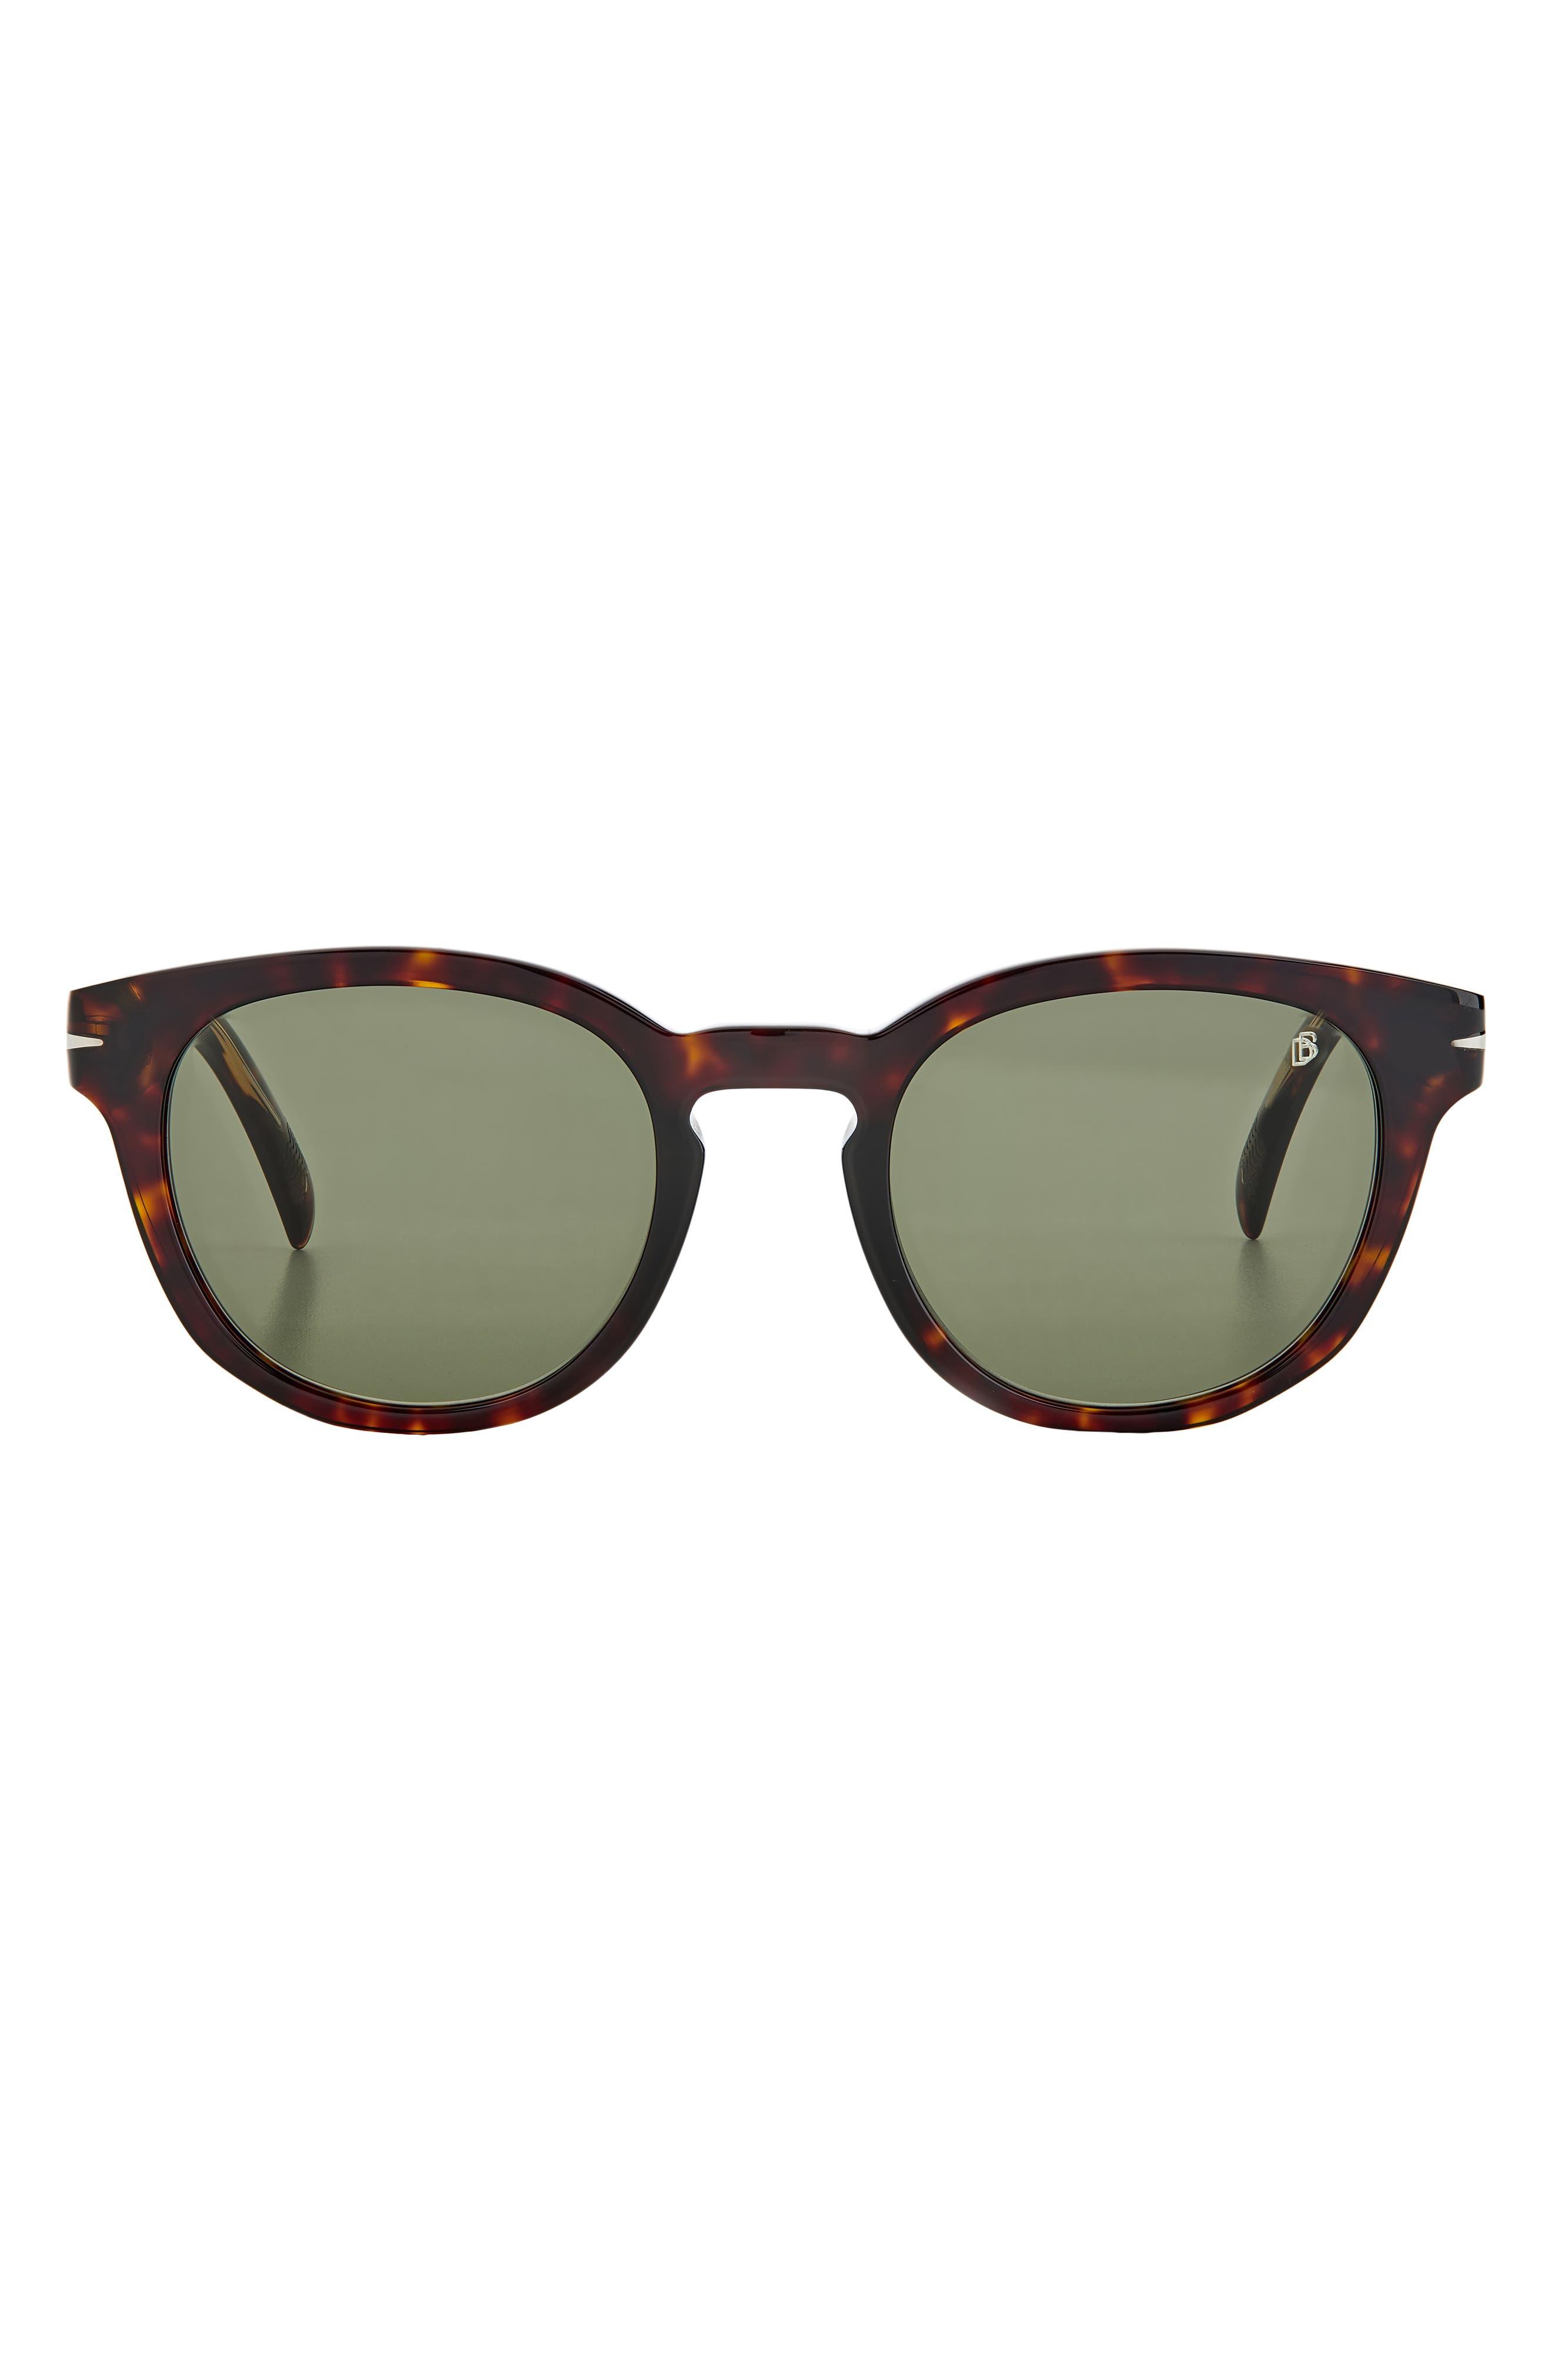 Men's David Beckham 50mm Round Sunglasses